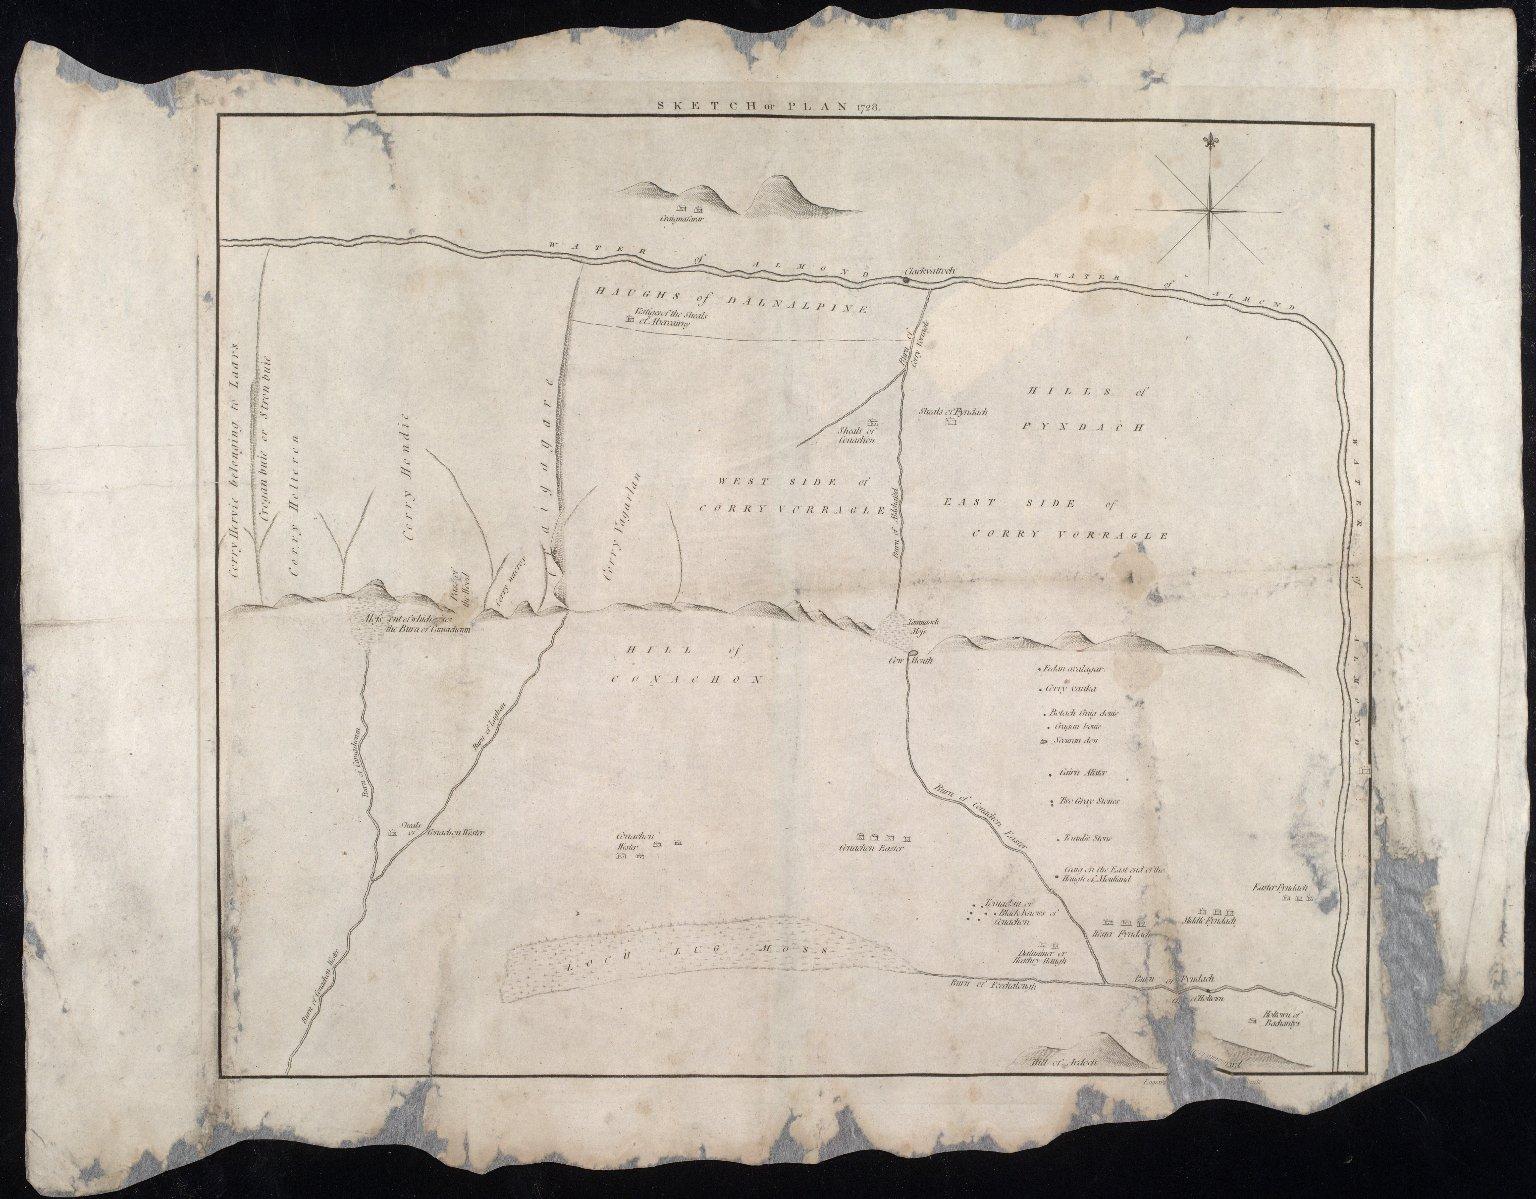 Sketch or Plan 1728. [1 of 1]